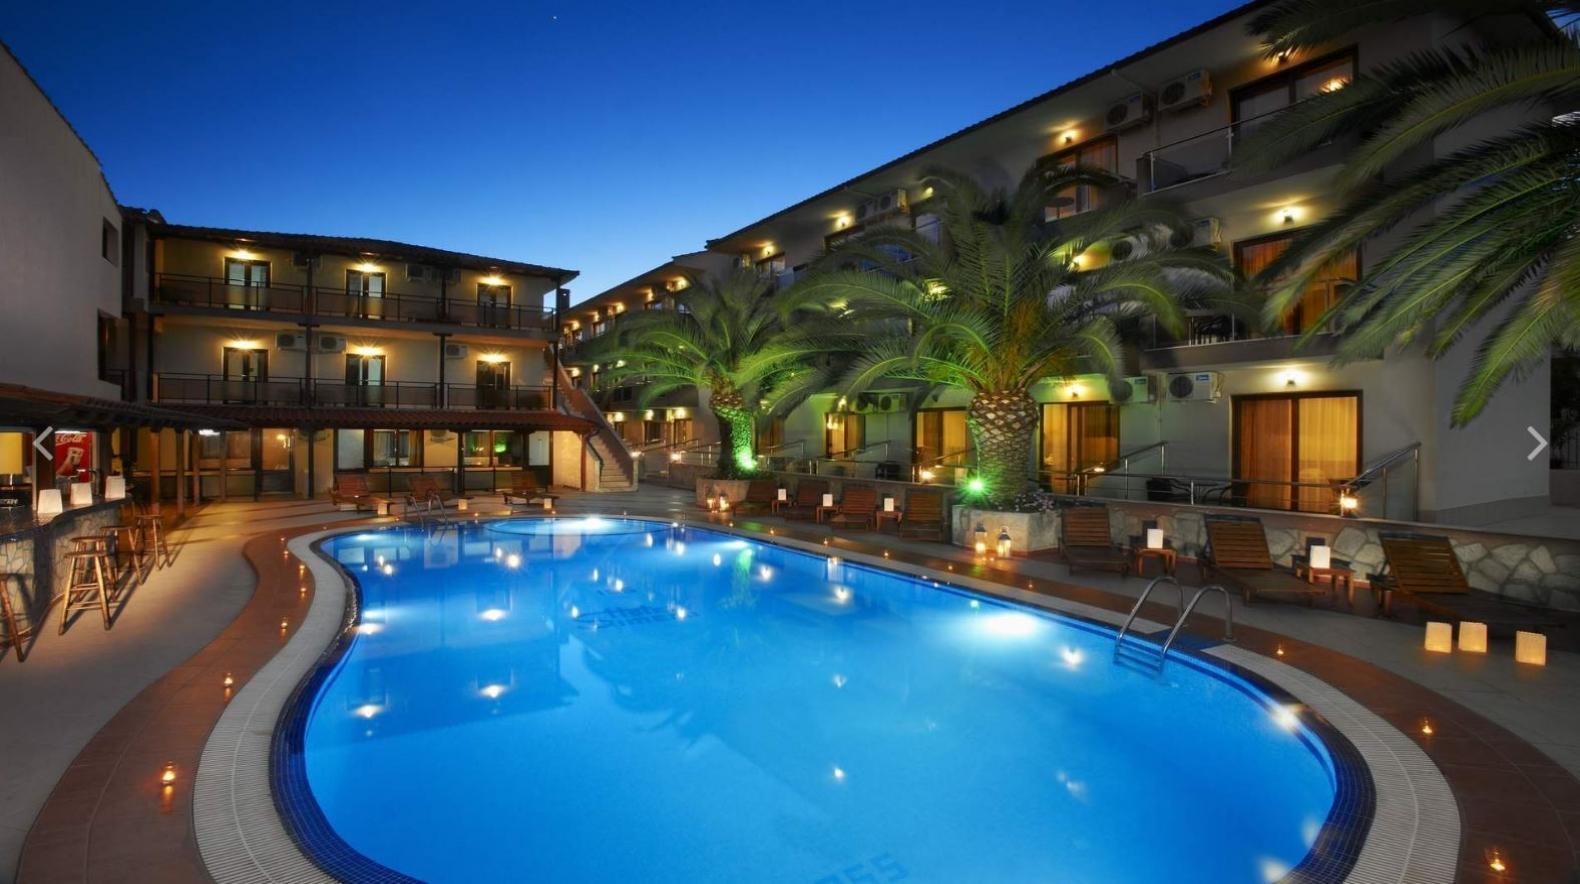 Simeon Hotel - Μεταμόρφωση, Χαλκιδική ✦ 3 Ημέρες (2 Διανυκτερεύσεις) ✦ 2 άτομα ✦ Ημιδιατροφή ✦ 11/09/2020 έως 20/09/2020 ✦ Με την αγορά 6 διανυκτερεύσεων δίδεται η 7η διανυκτέρευση δώρο!